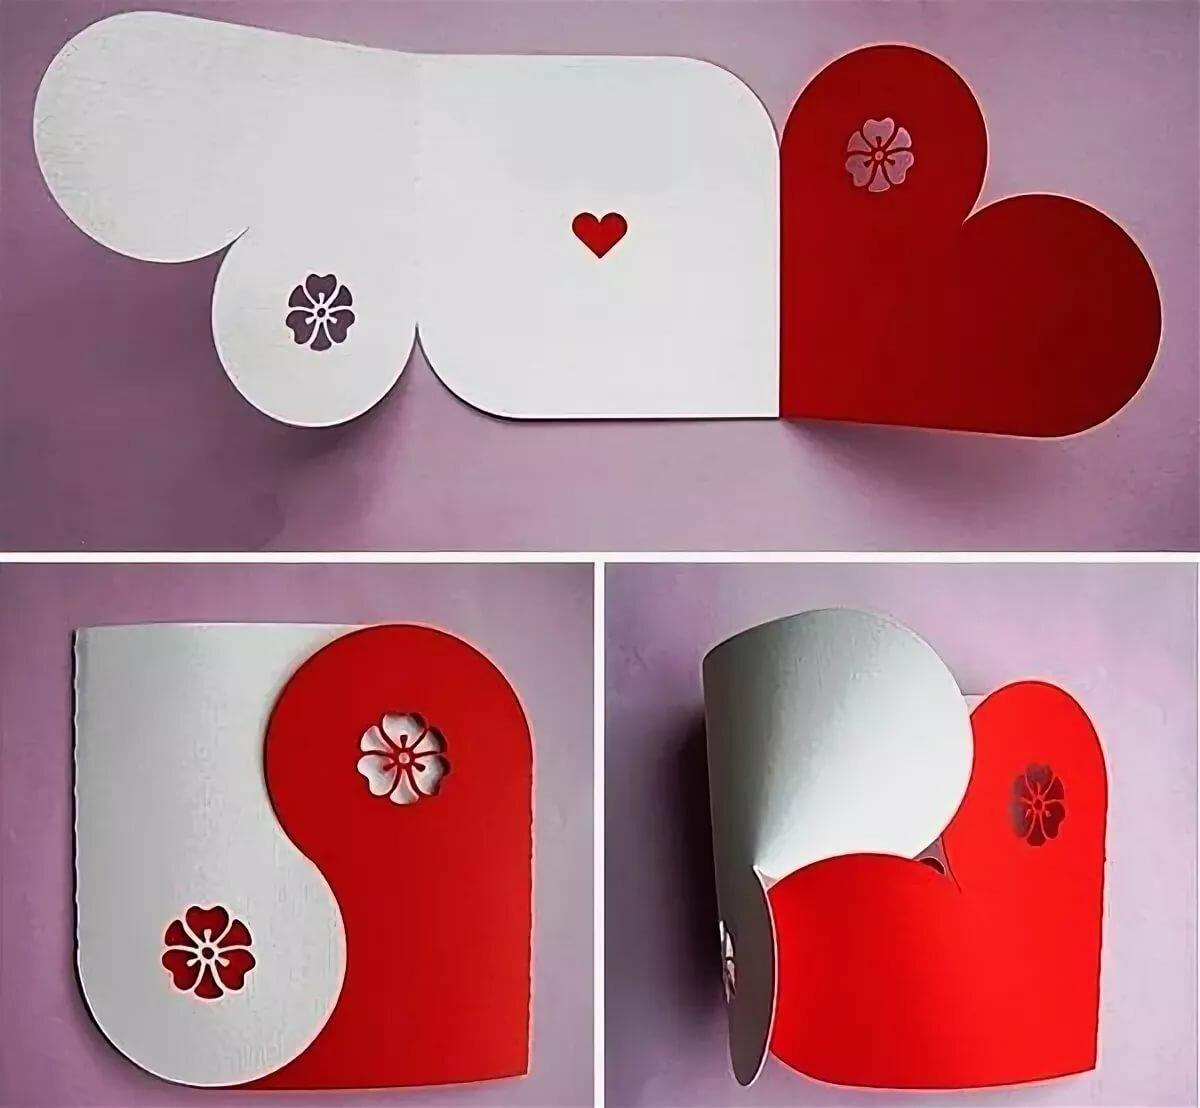 Валентинки как открытки